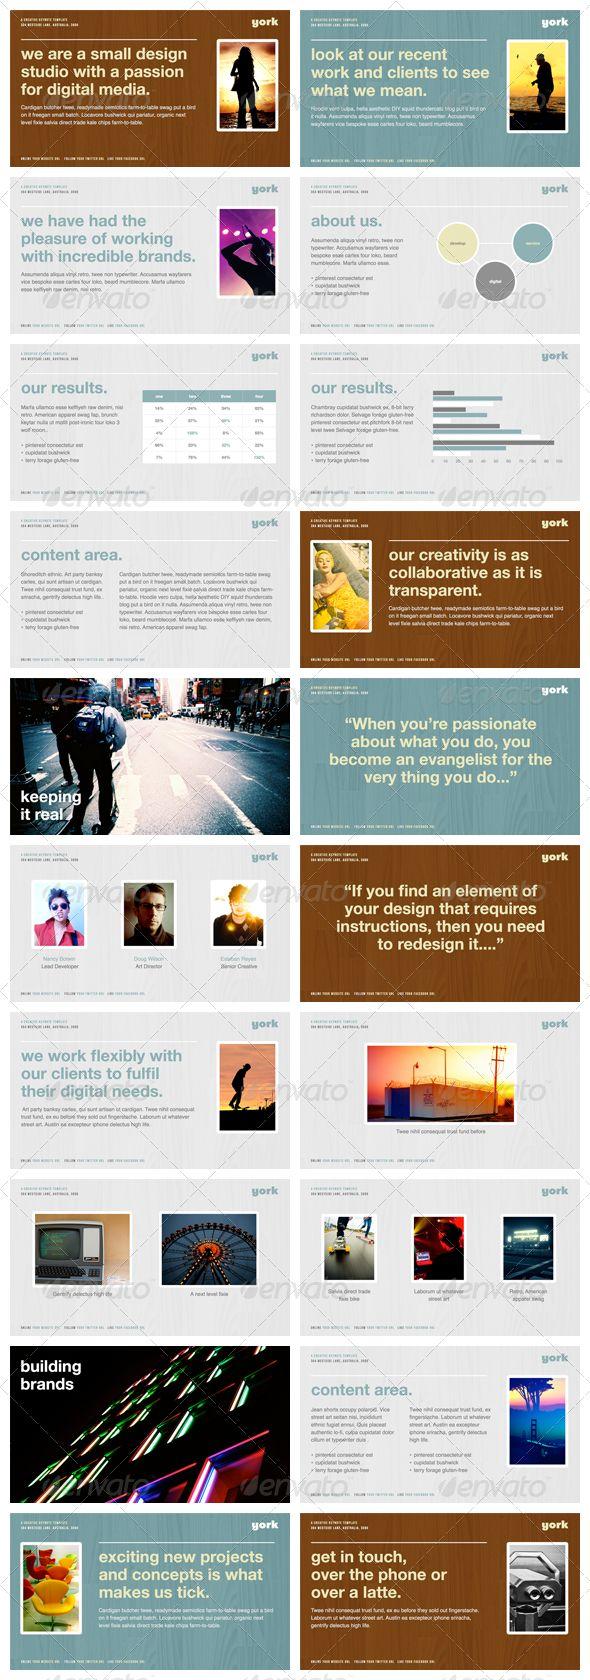 56 best powerpoint images on pinterest powerpoint presentation york powerpoint presentation template toneelgroepblik Images